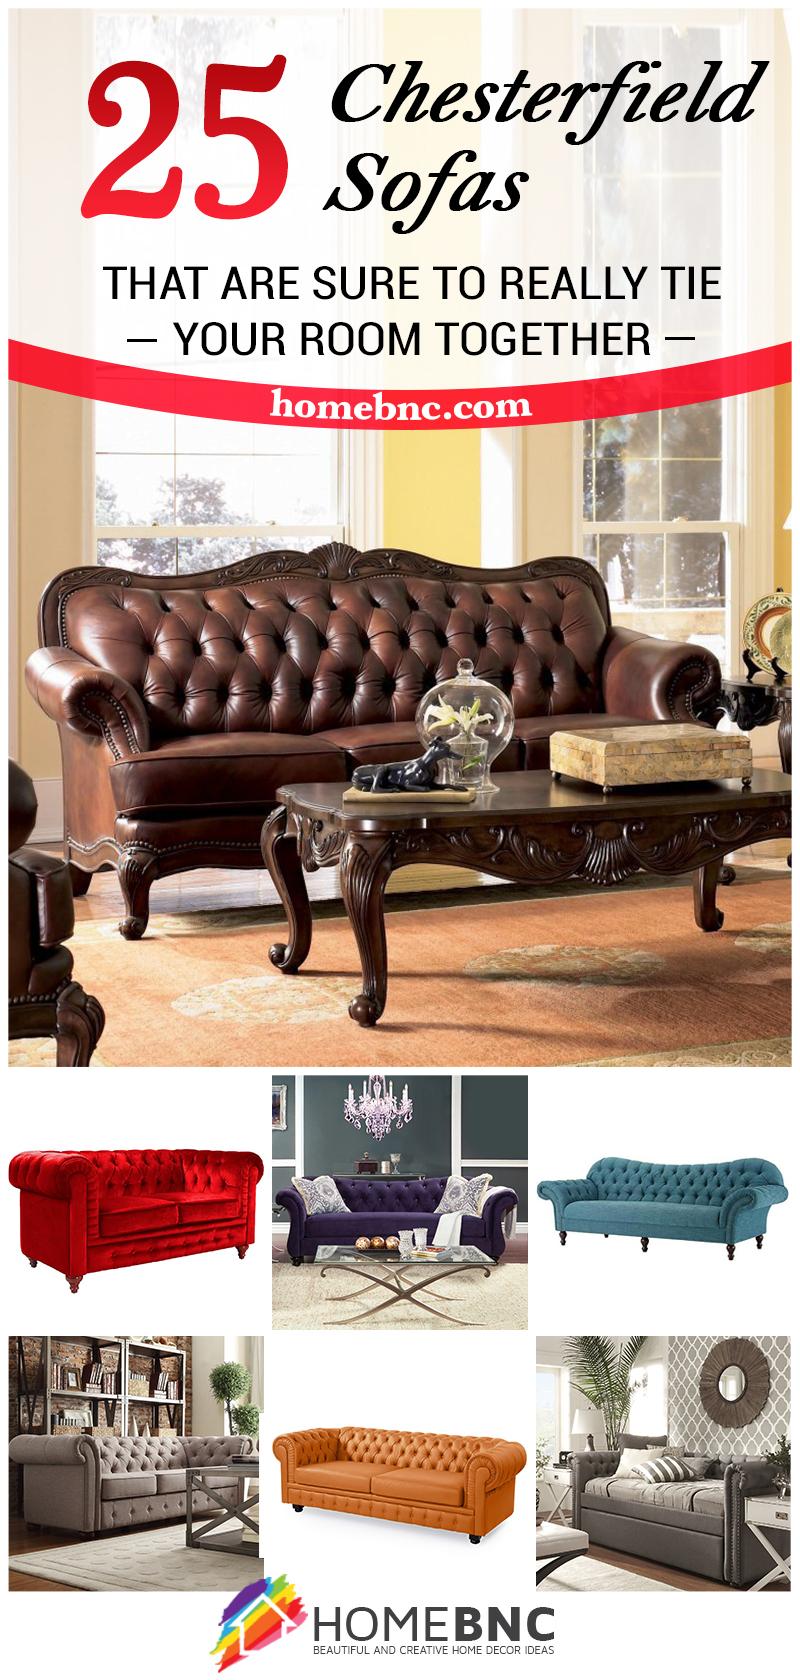 Best Chesterfield Sofa Ideas Pinterest Share Homebnc